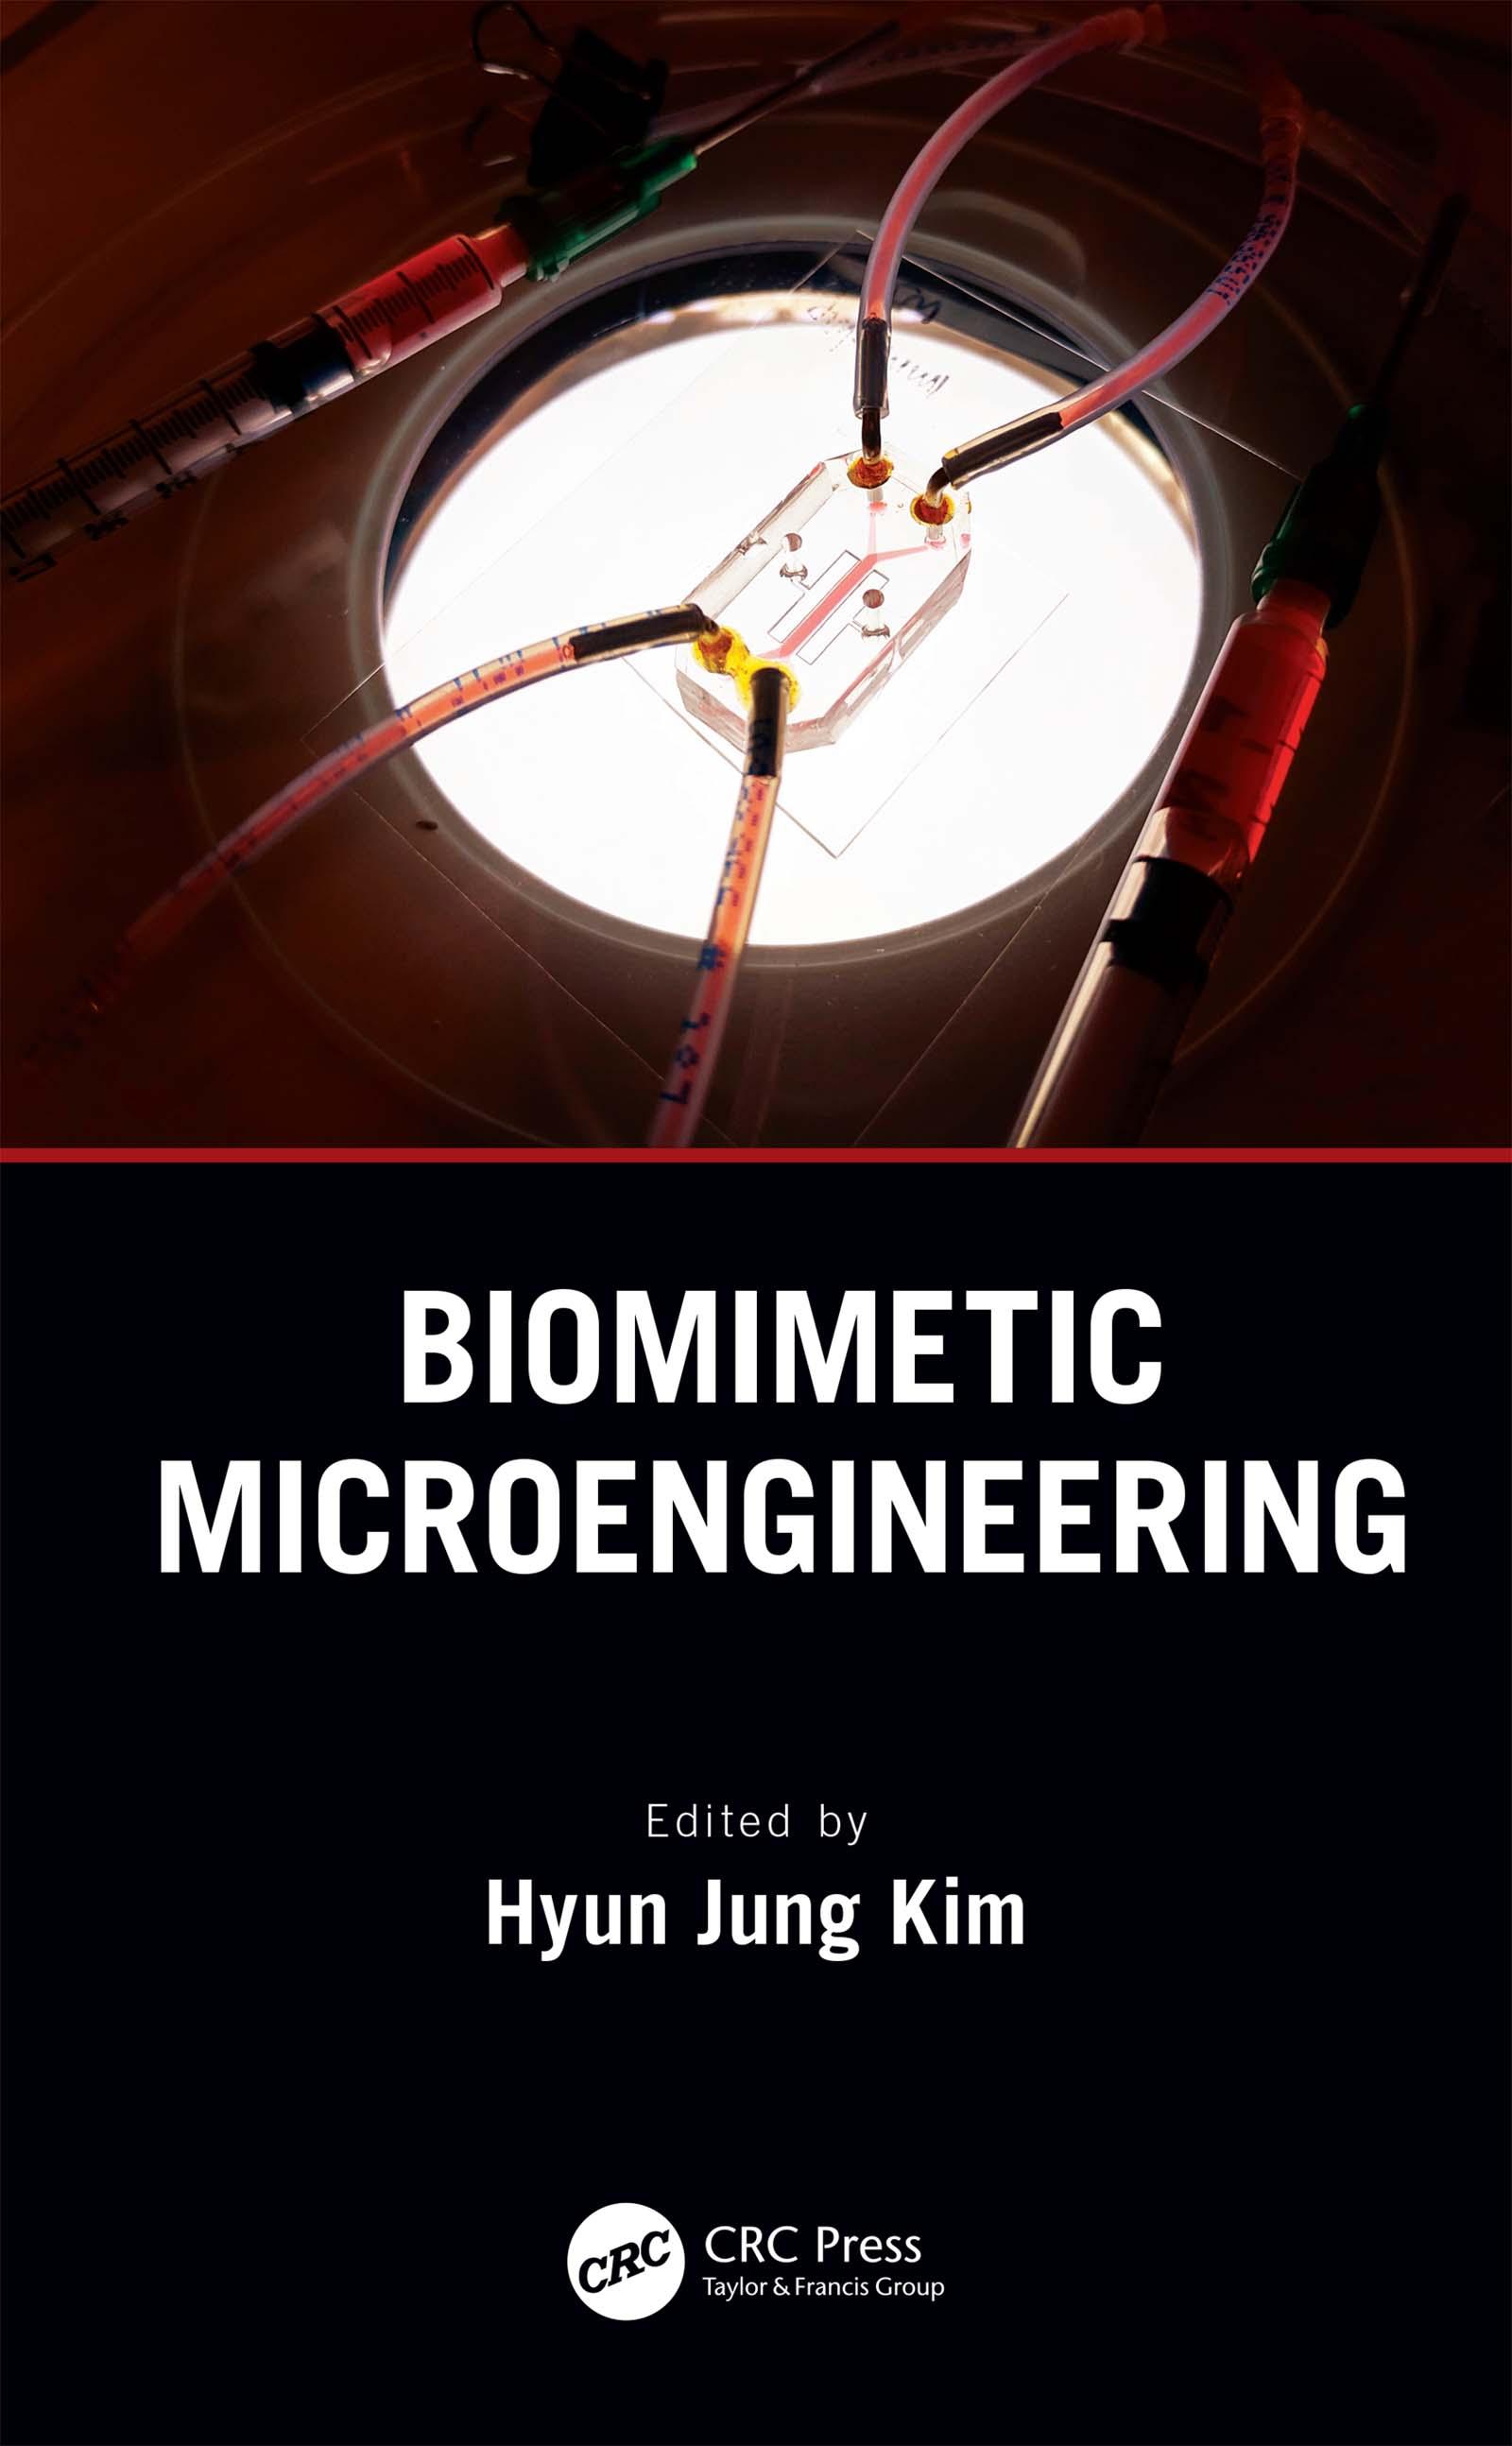 Biomimetic Microengineering book cover